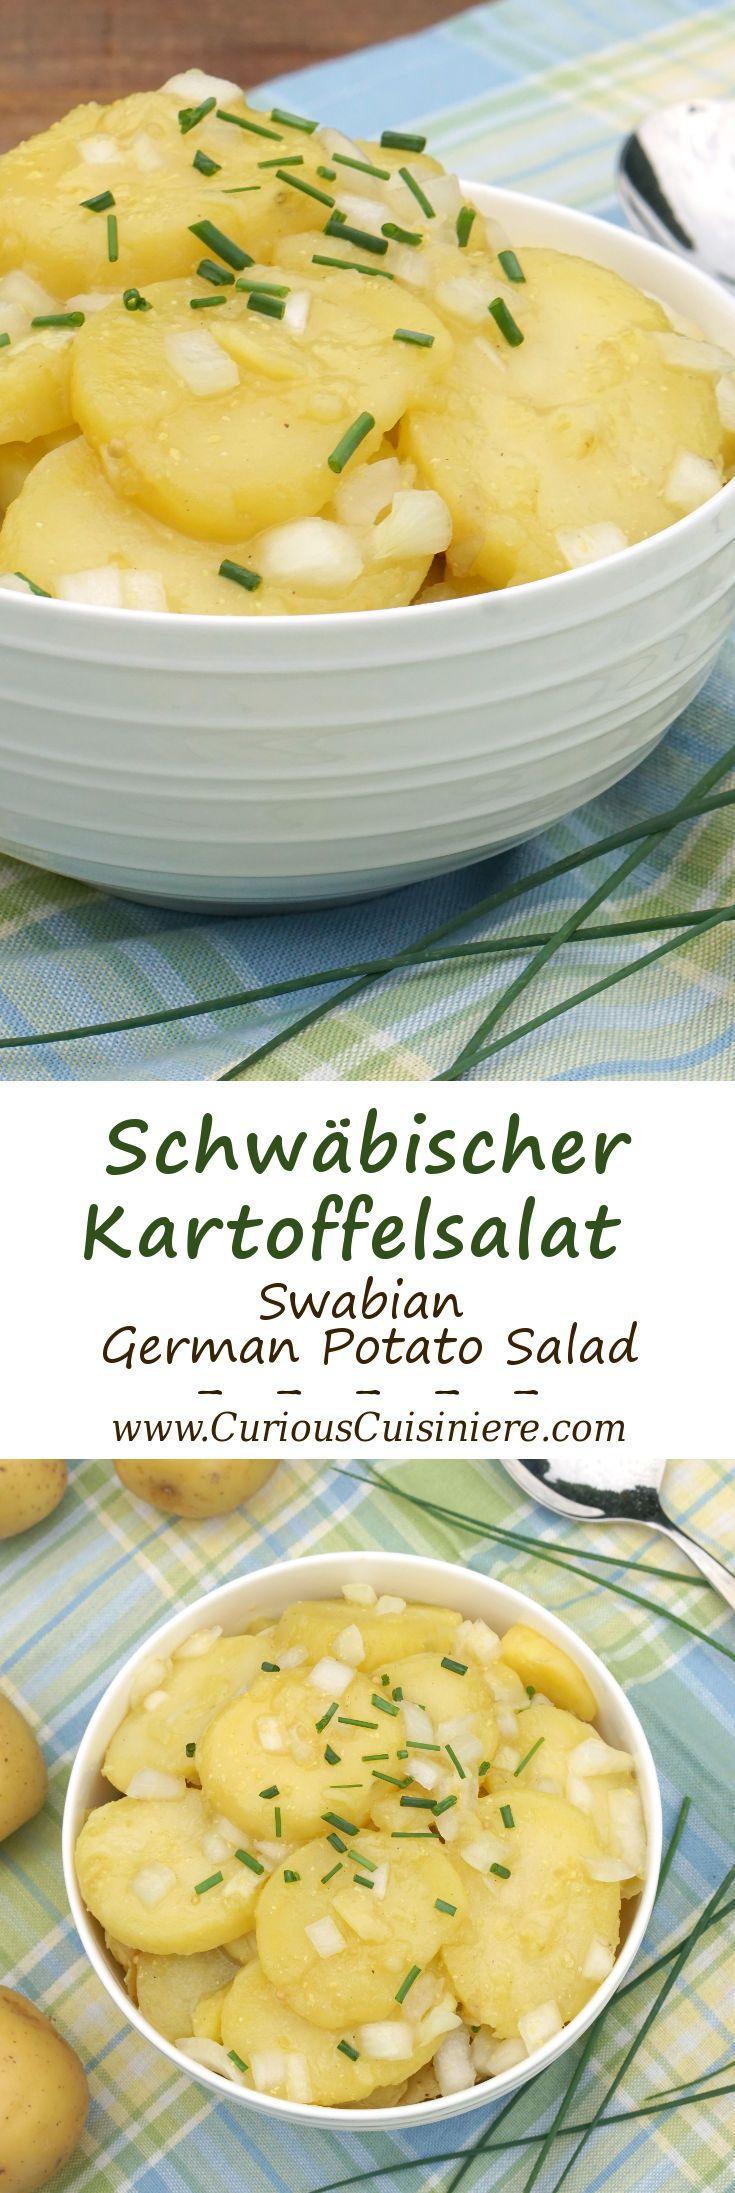 Tangy and sweet Schwabischer Kartoffelsalat, is flavorful German Potato Salad…